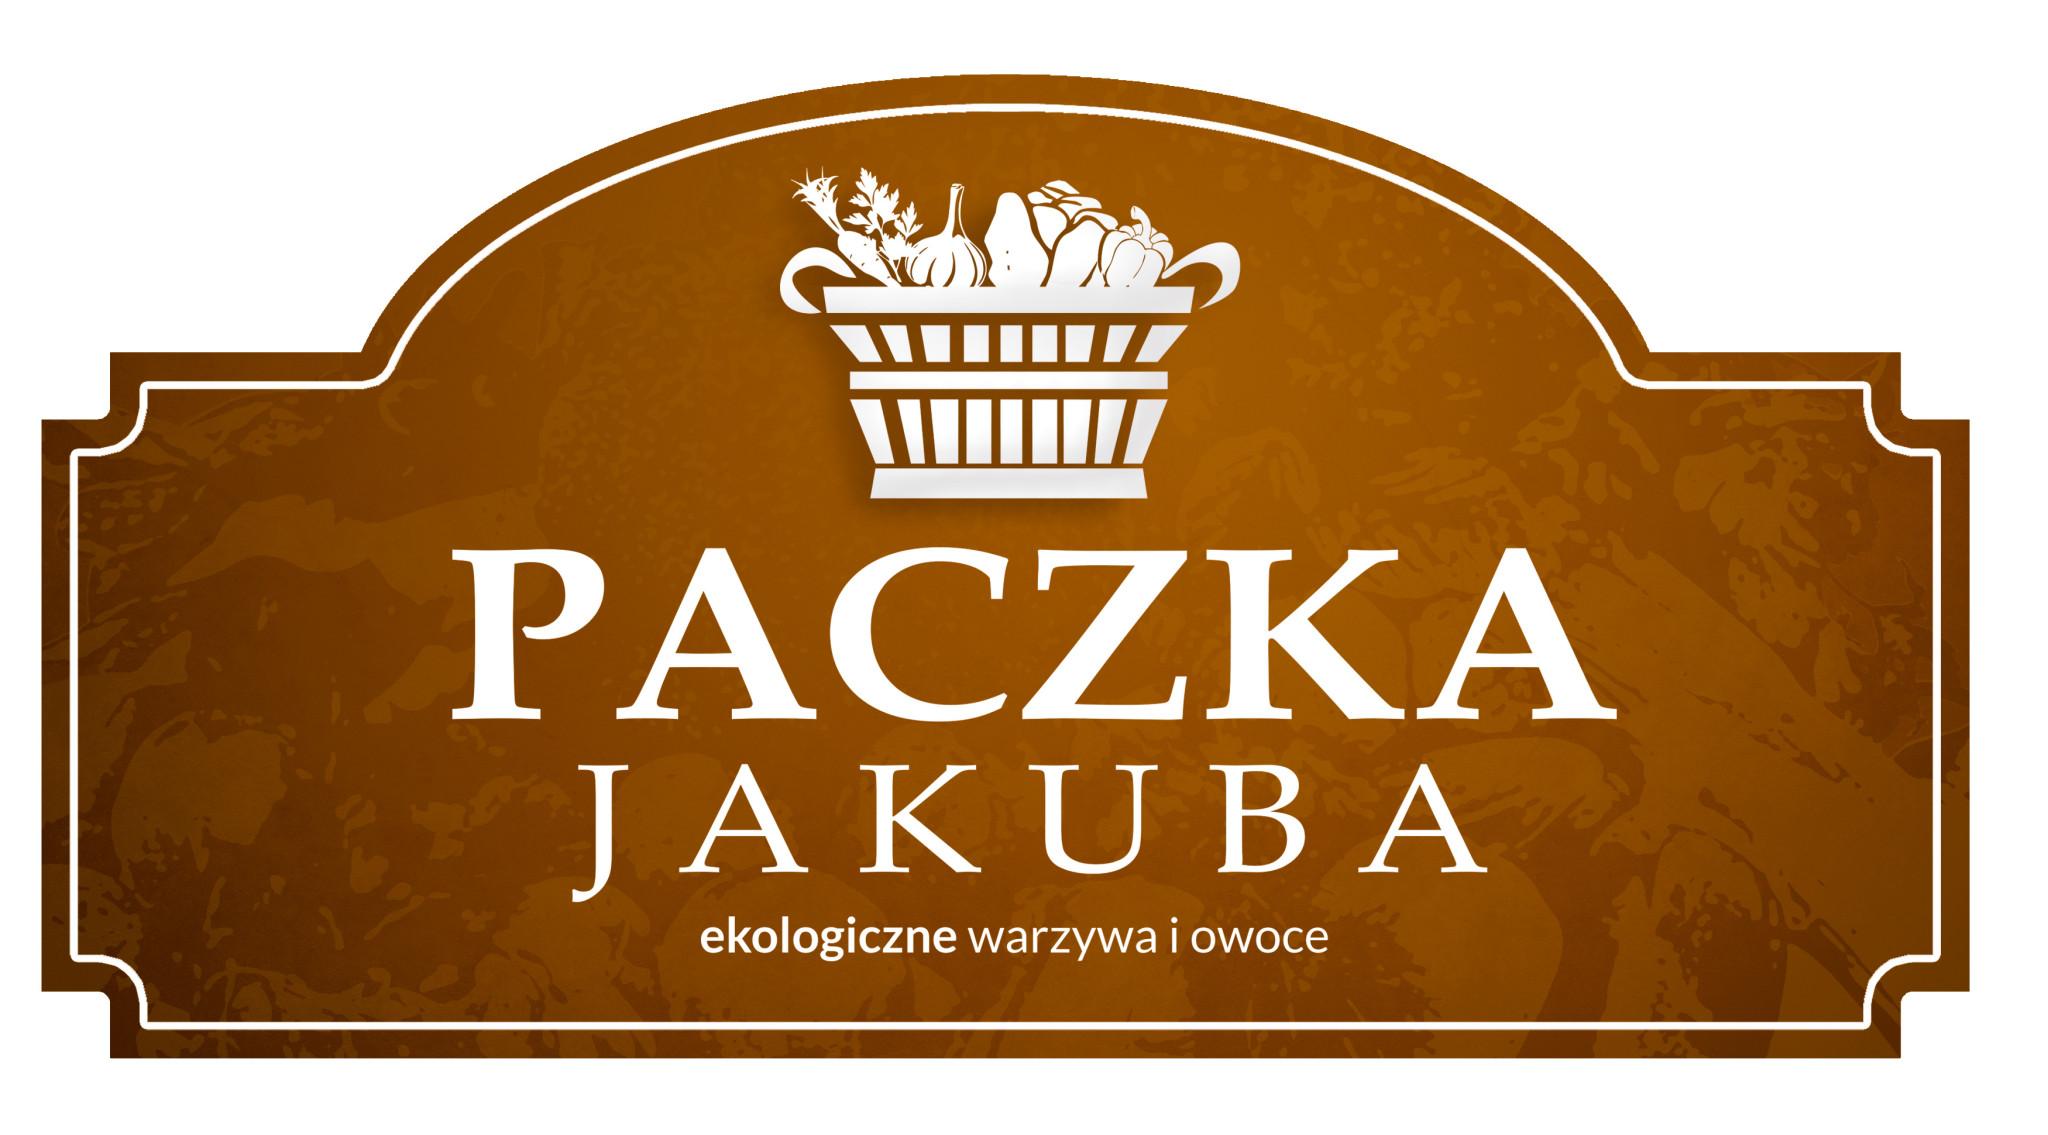 Paczka Jakuba brings farm-fresh food to Cracovians' doorsteps